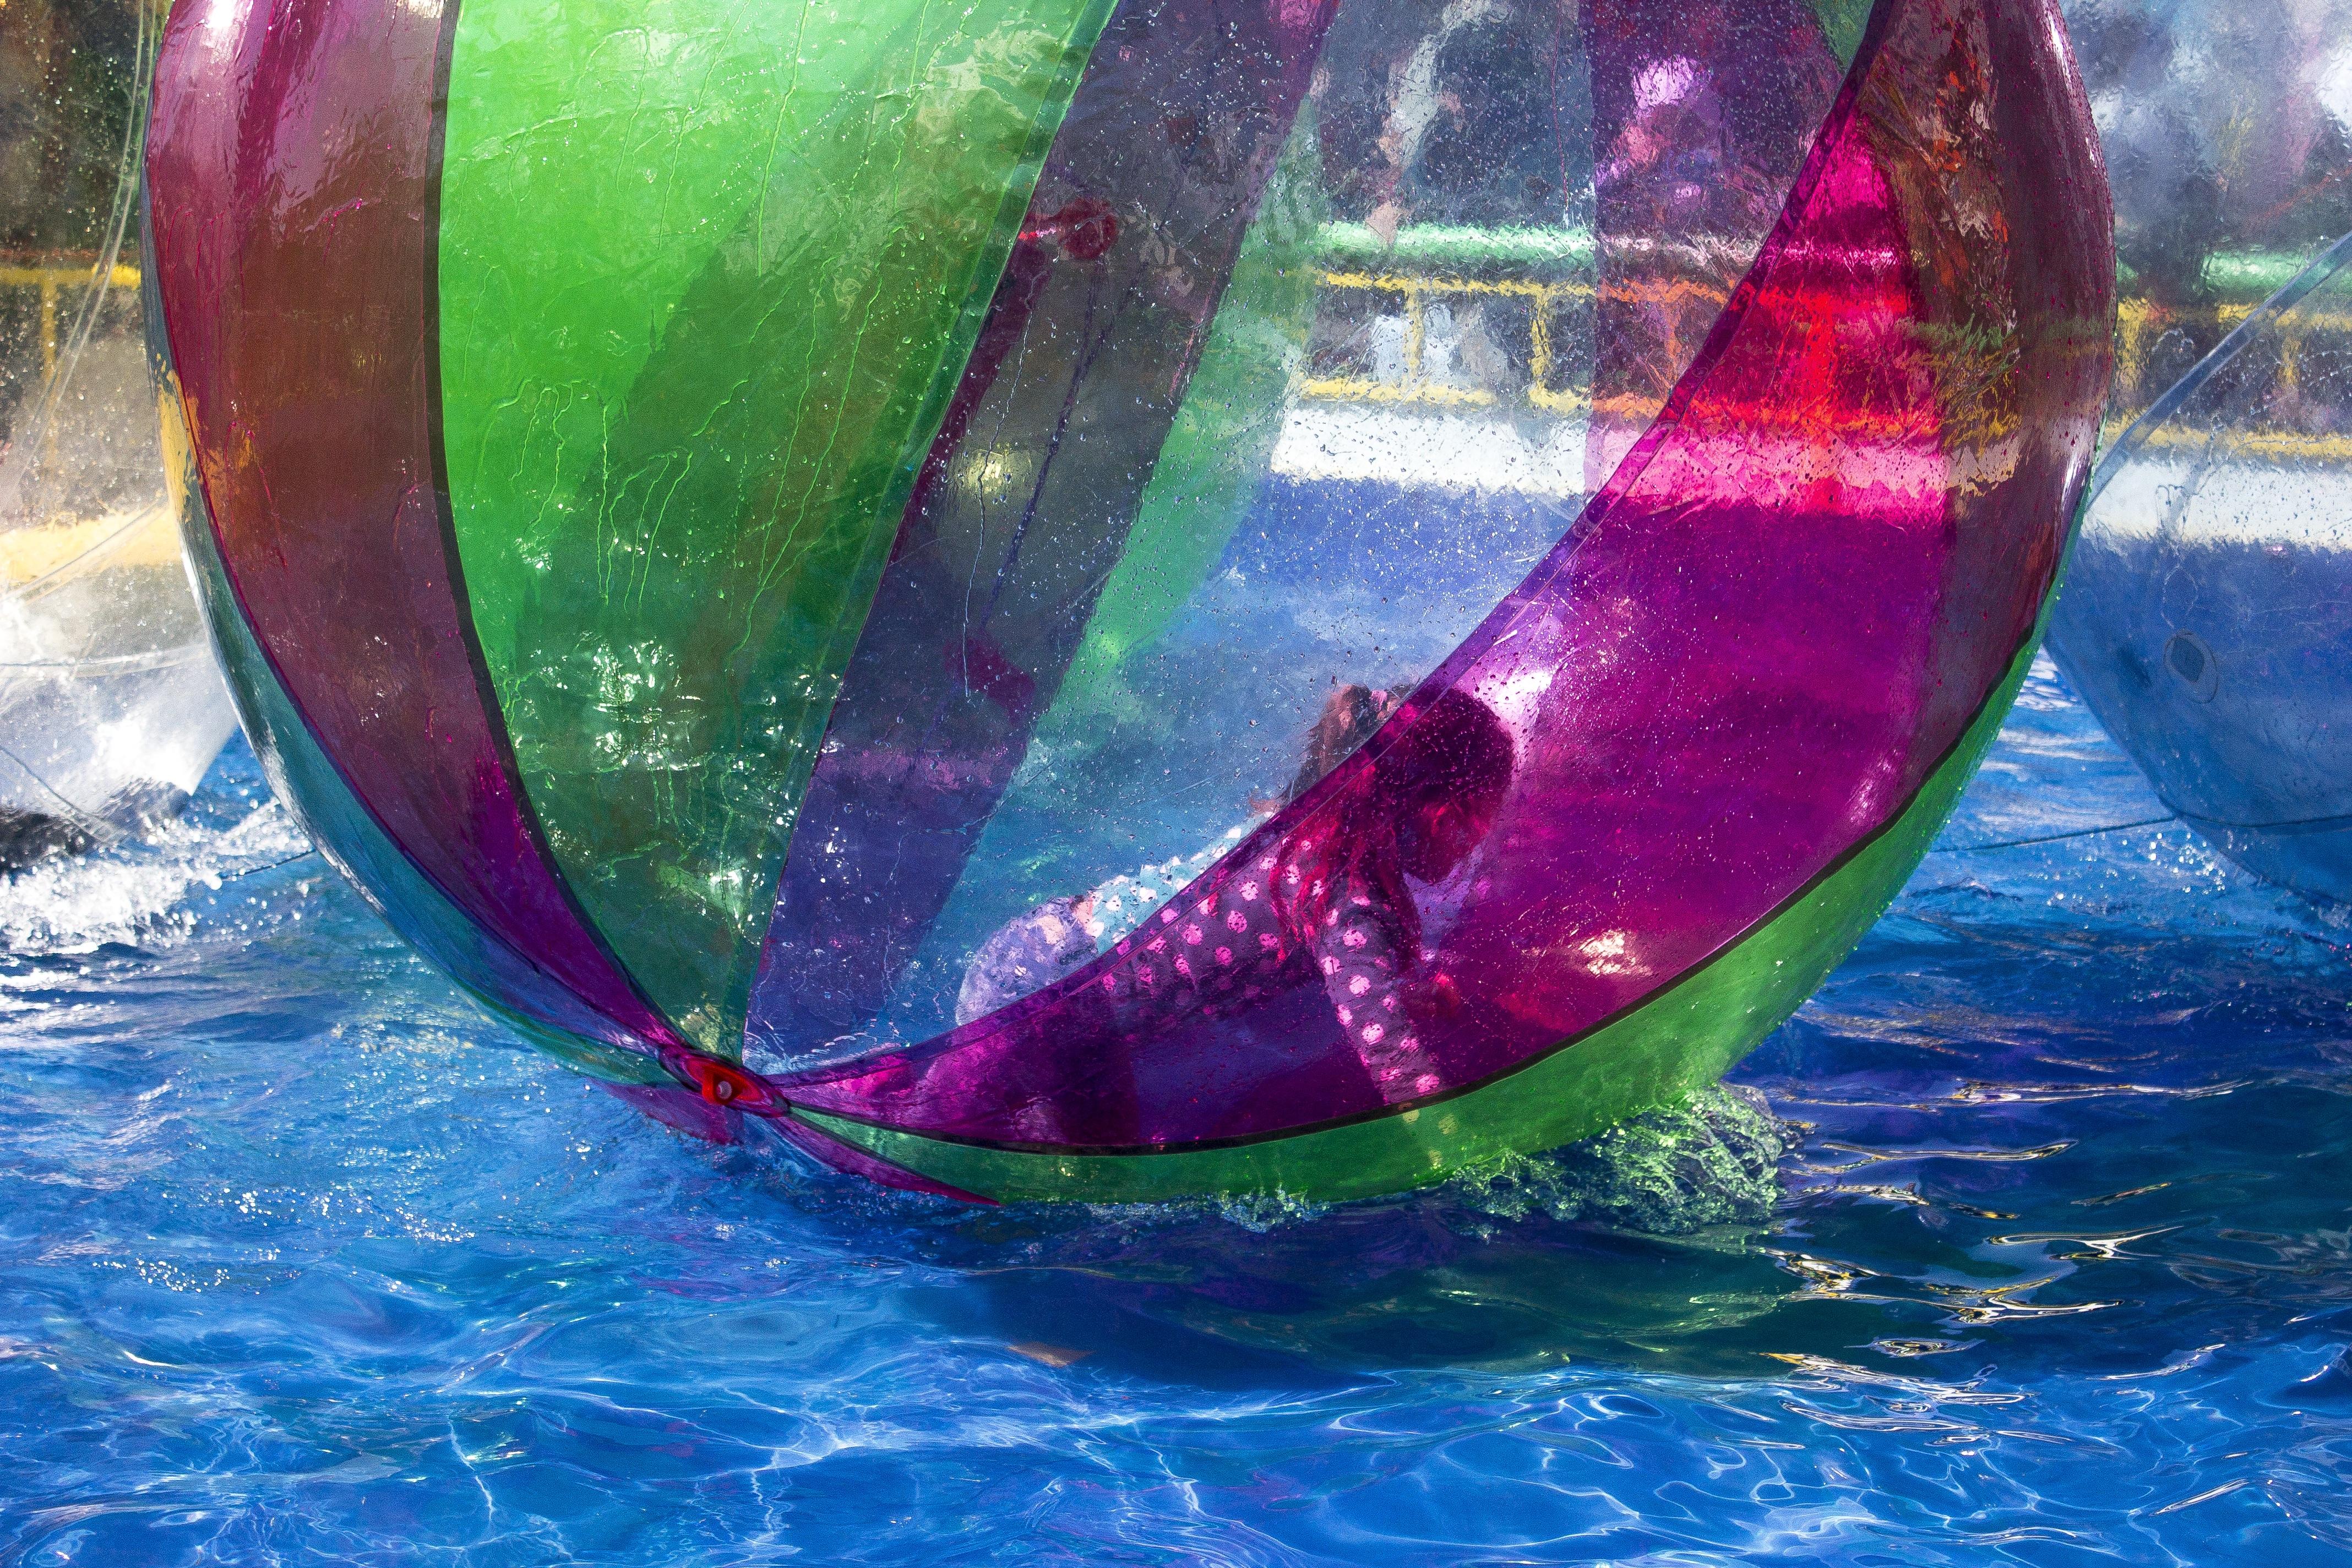 Kostenlose foto : Boot, spielen, Welle, lila, Grün, Betrachtung ...